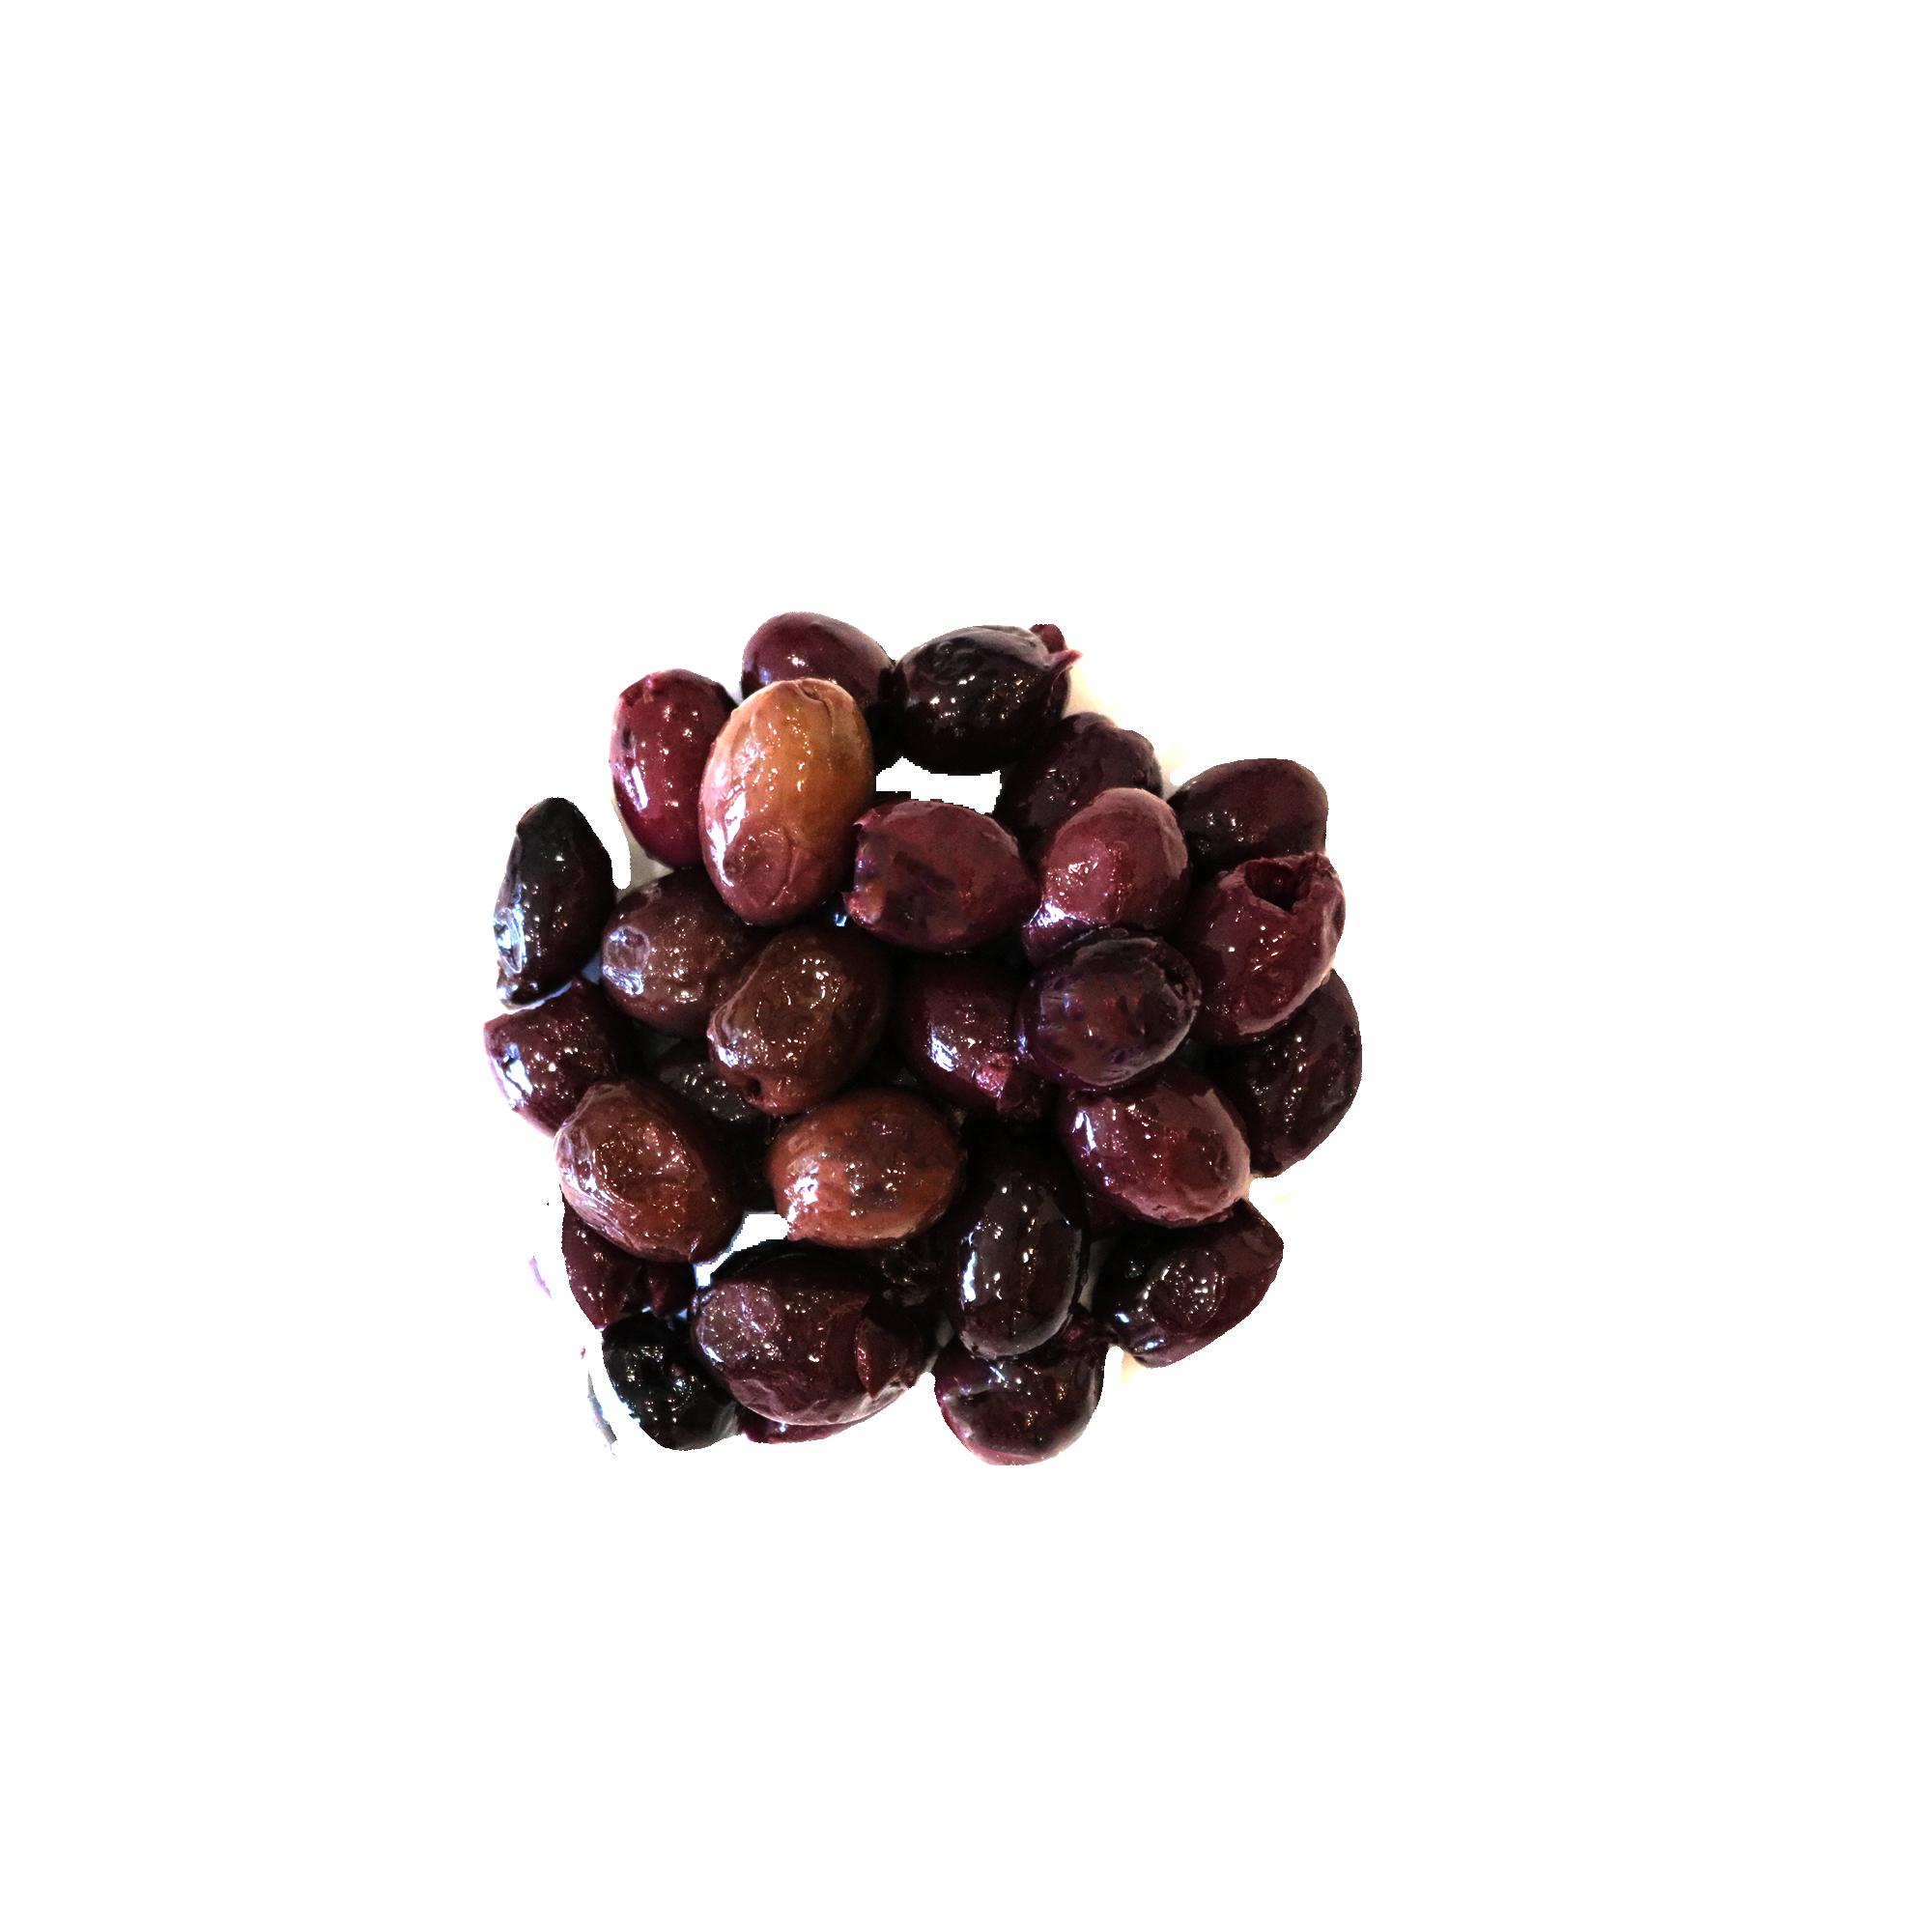 olives - Vegan | Gluten-Free